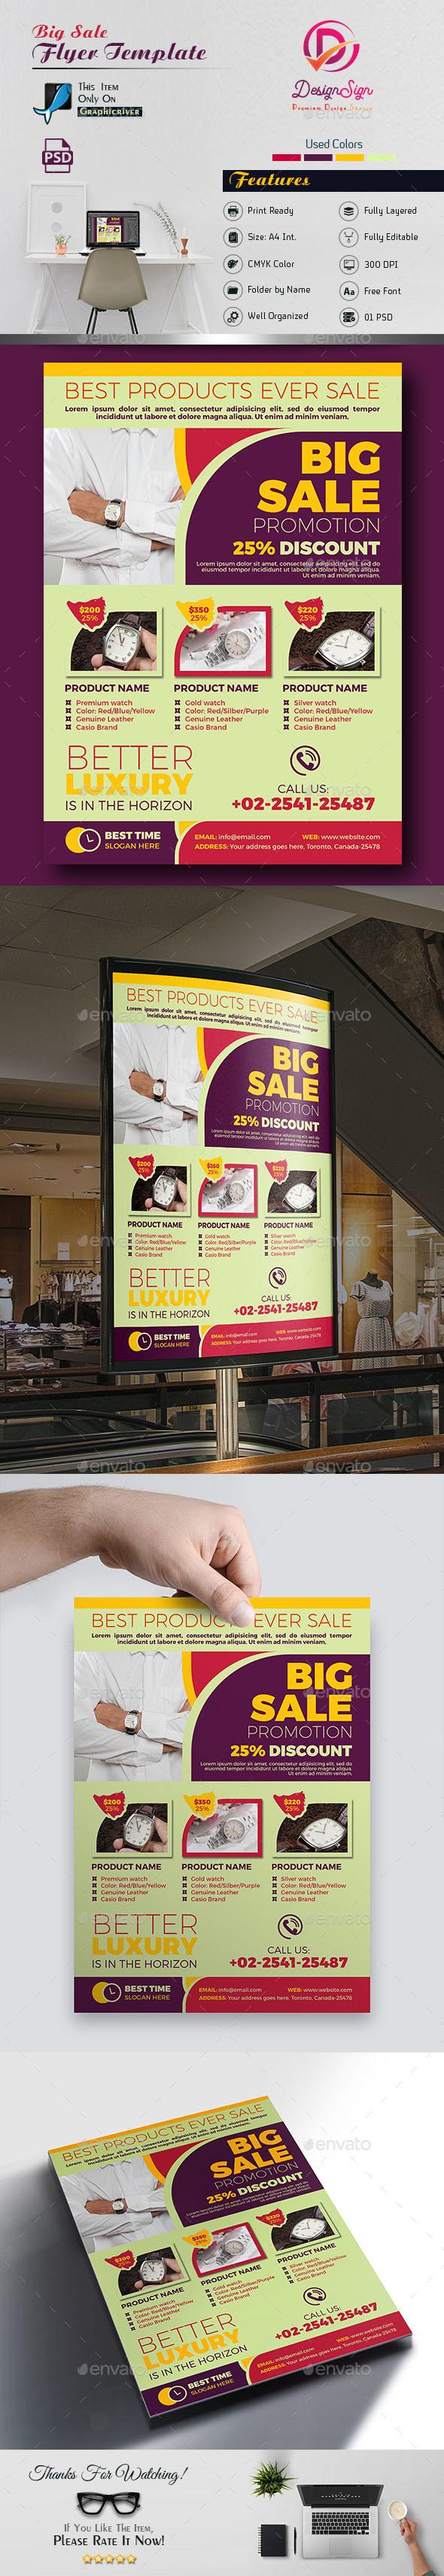 Big Sale Promotion Flyer - Flyers Print Templates